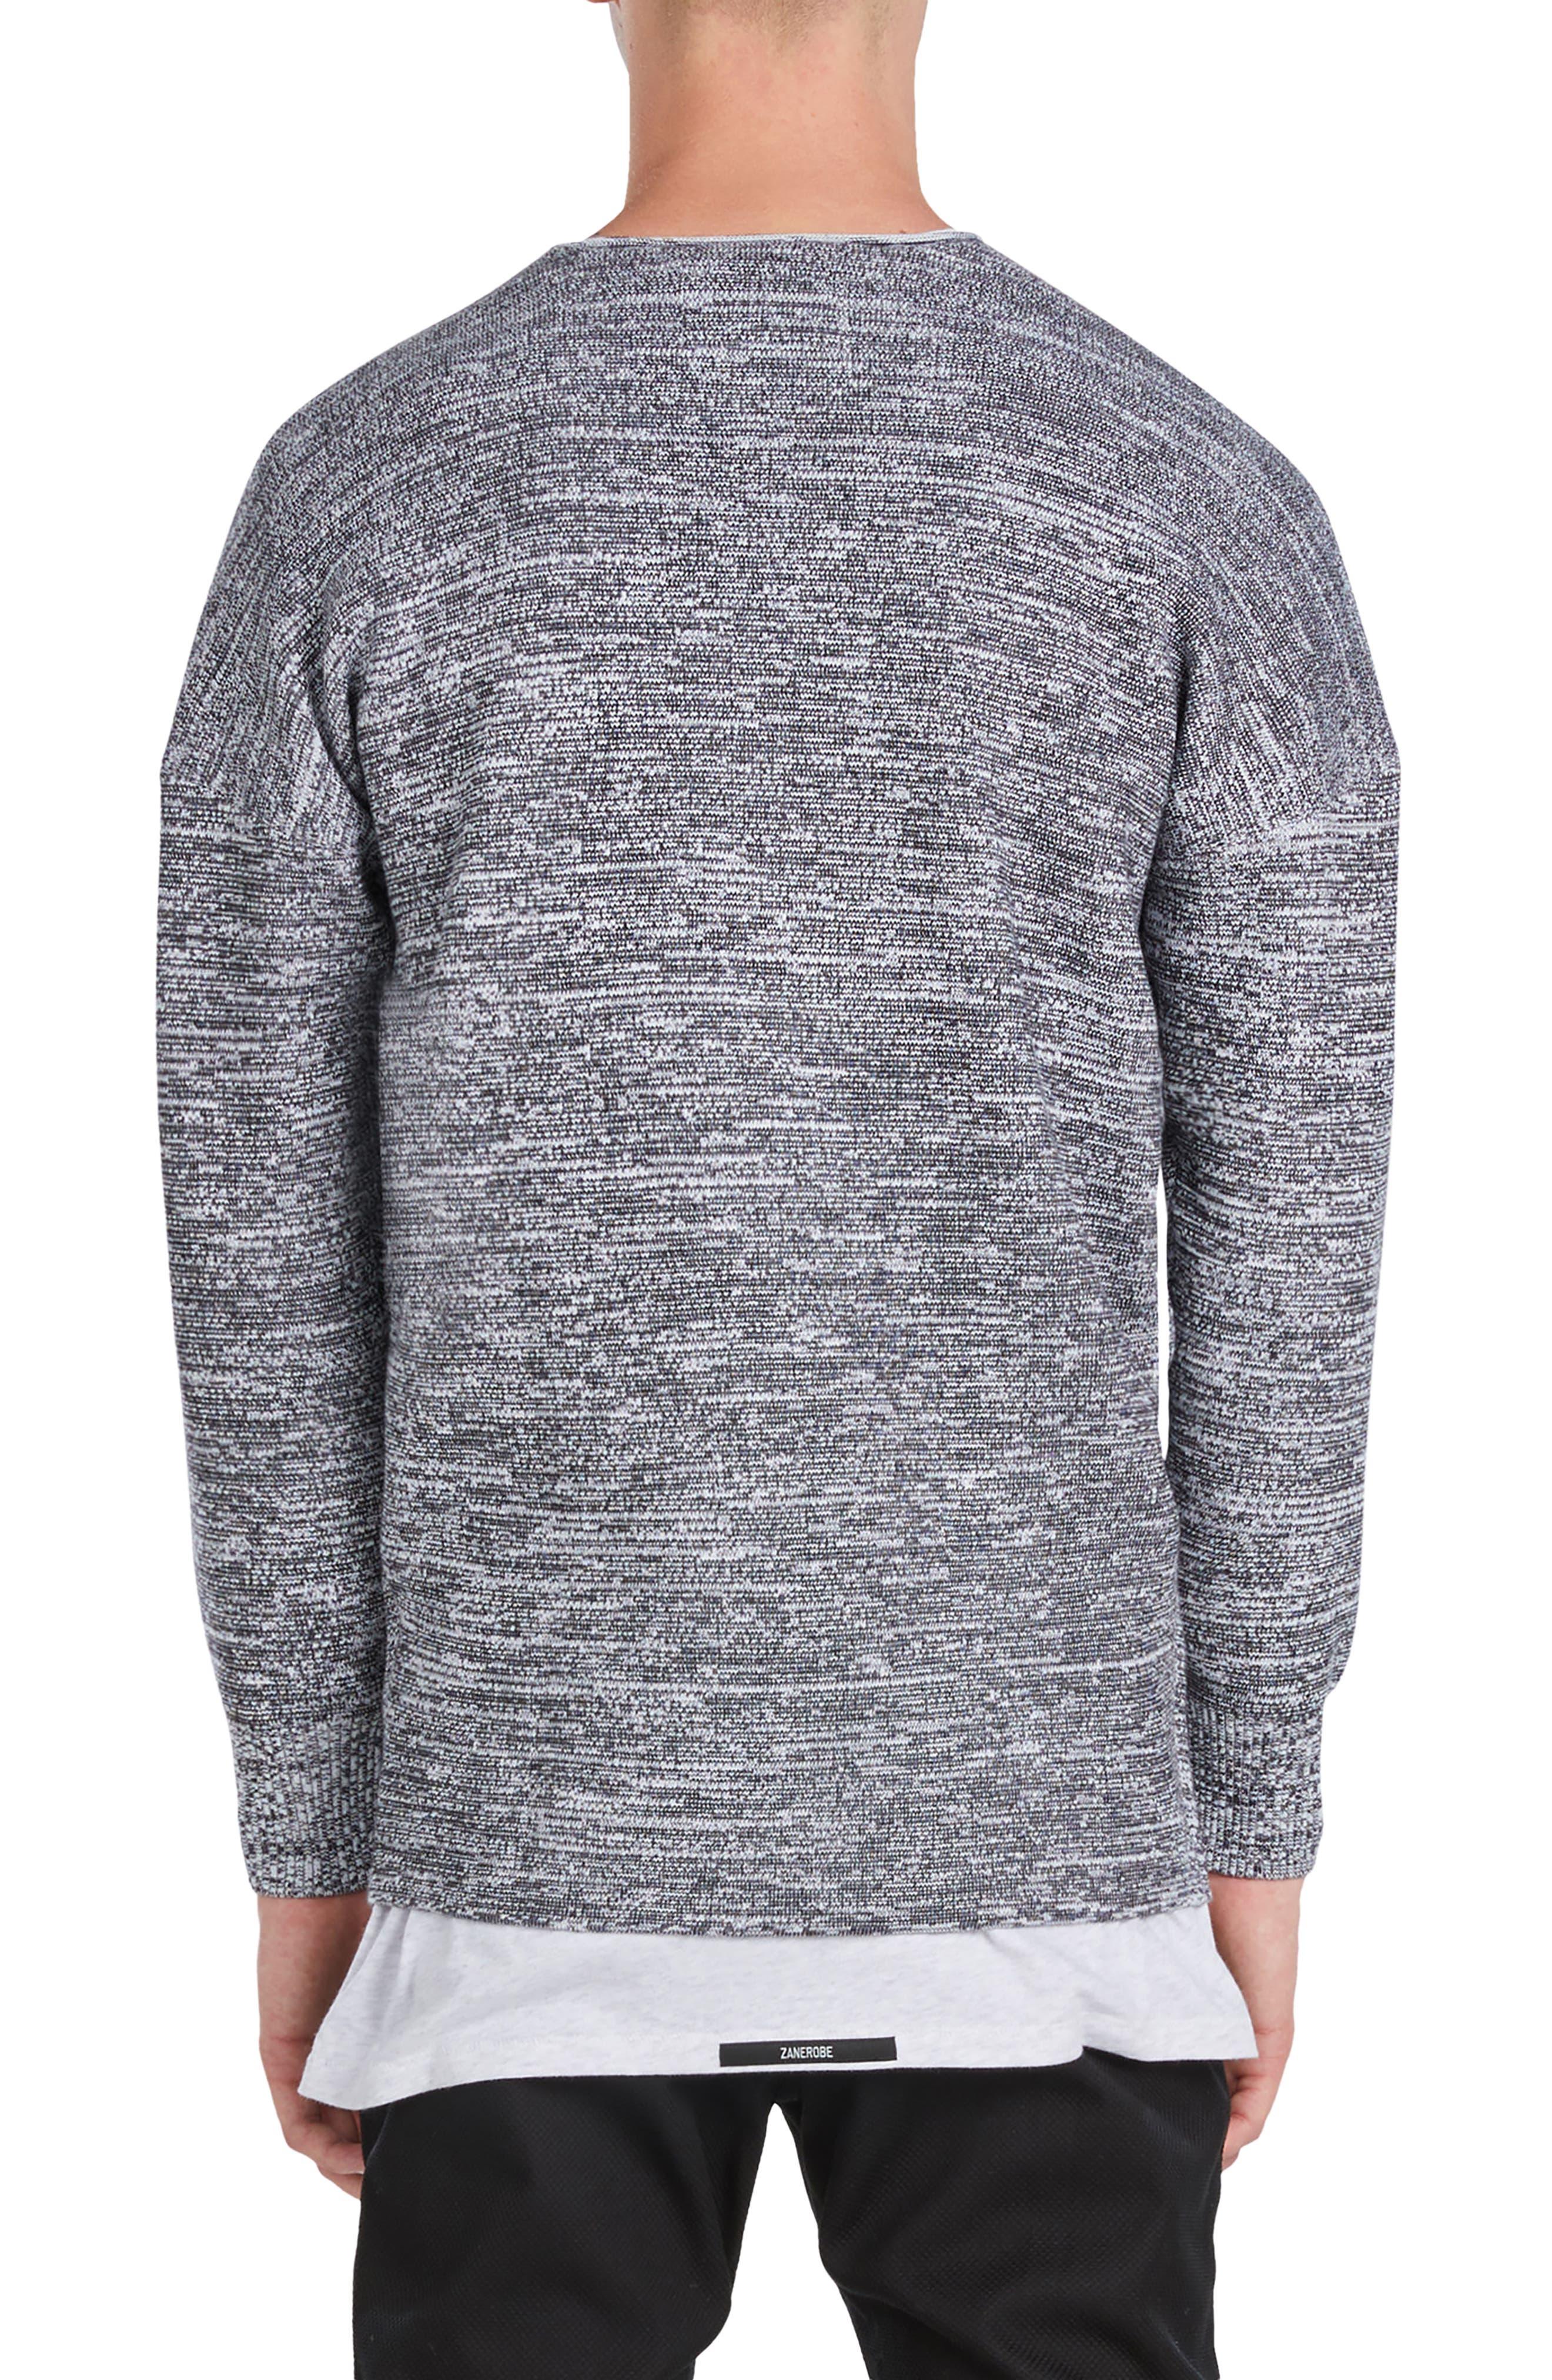 Cotch Knit Sweater,                             Alternate thumbnail 4, color,